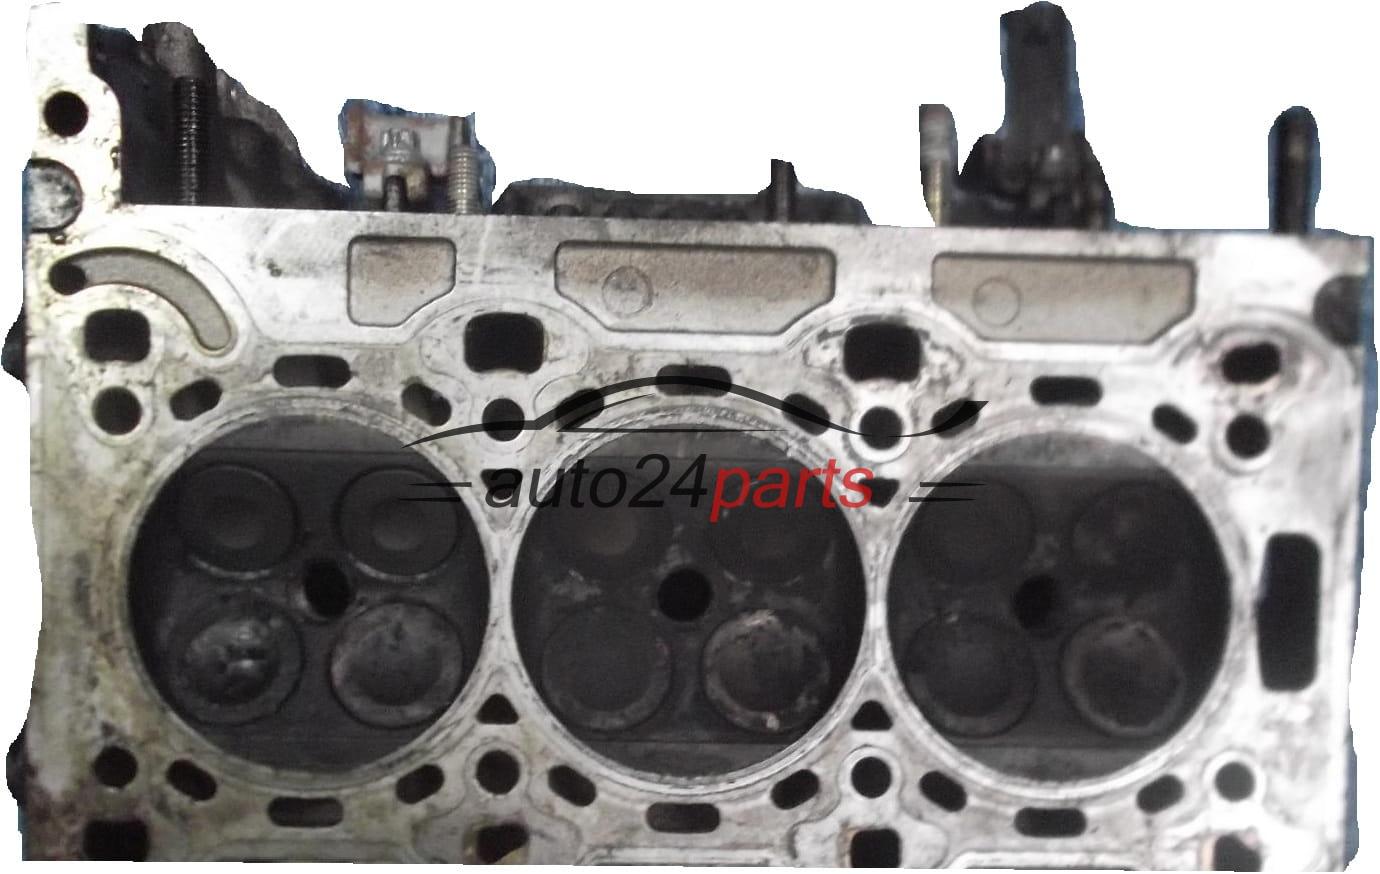 Engine Cylinder Head 10 12v Z10xep Ecotec Opel Chevrolet Holden Gm Vauxhall Agila Corsa 55351330 55355424 24469164 5607137 56 07 137 5607203 203